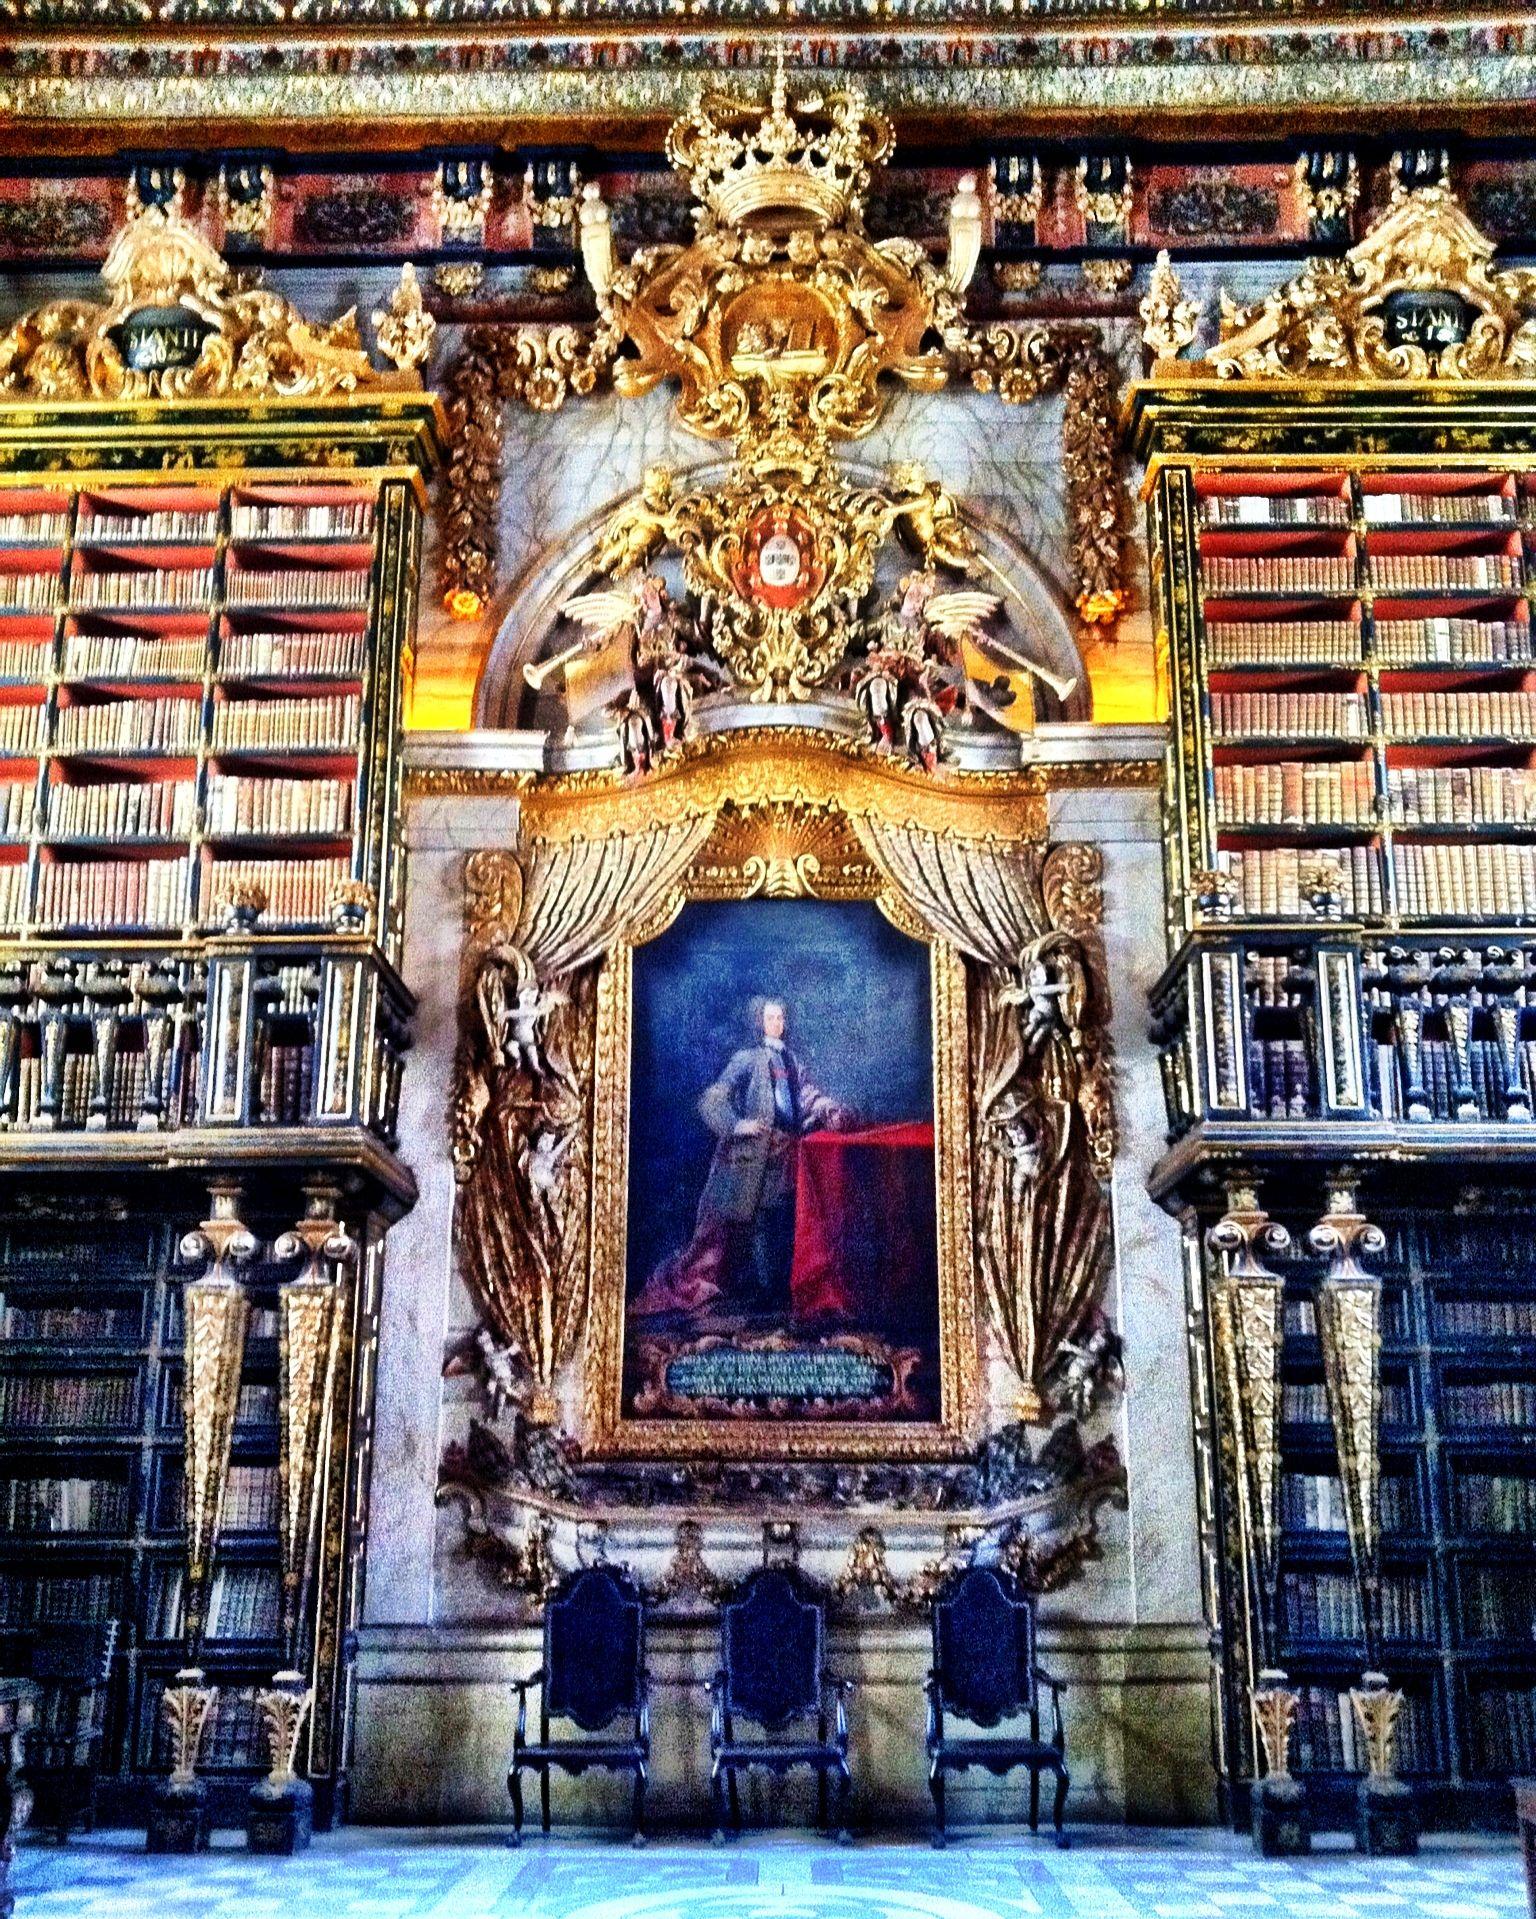 Biblioteca Joanina Universidade De Coimbra Coimbra Portugal